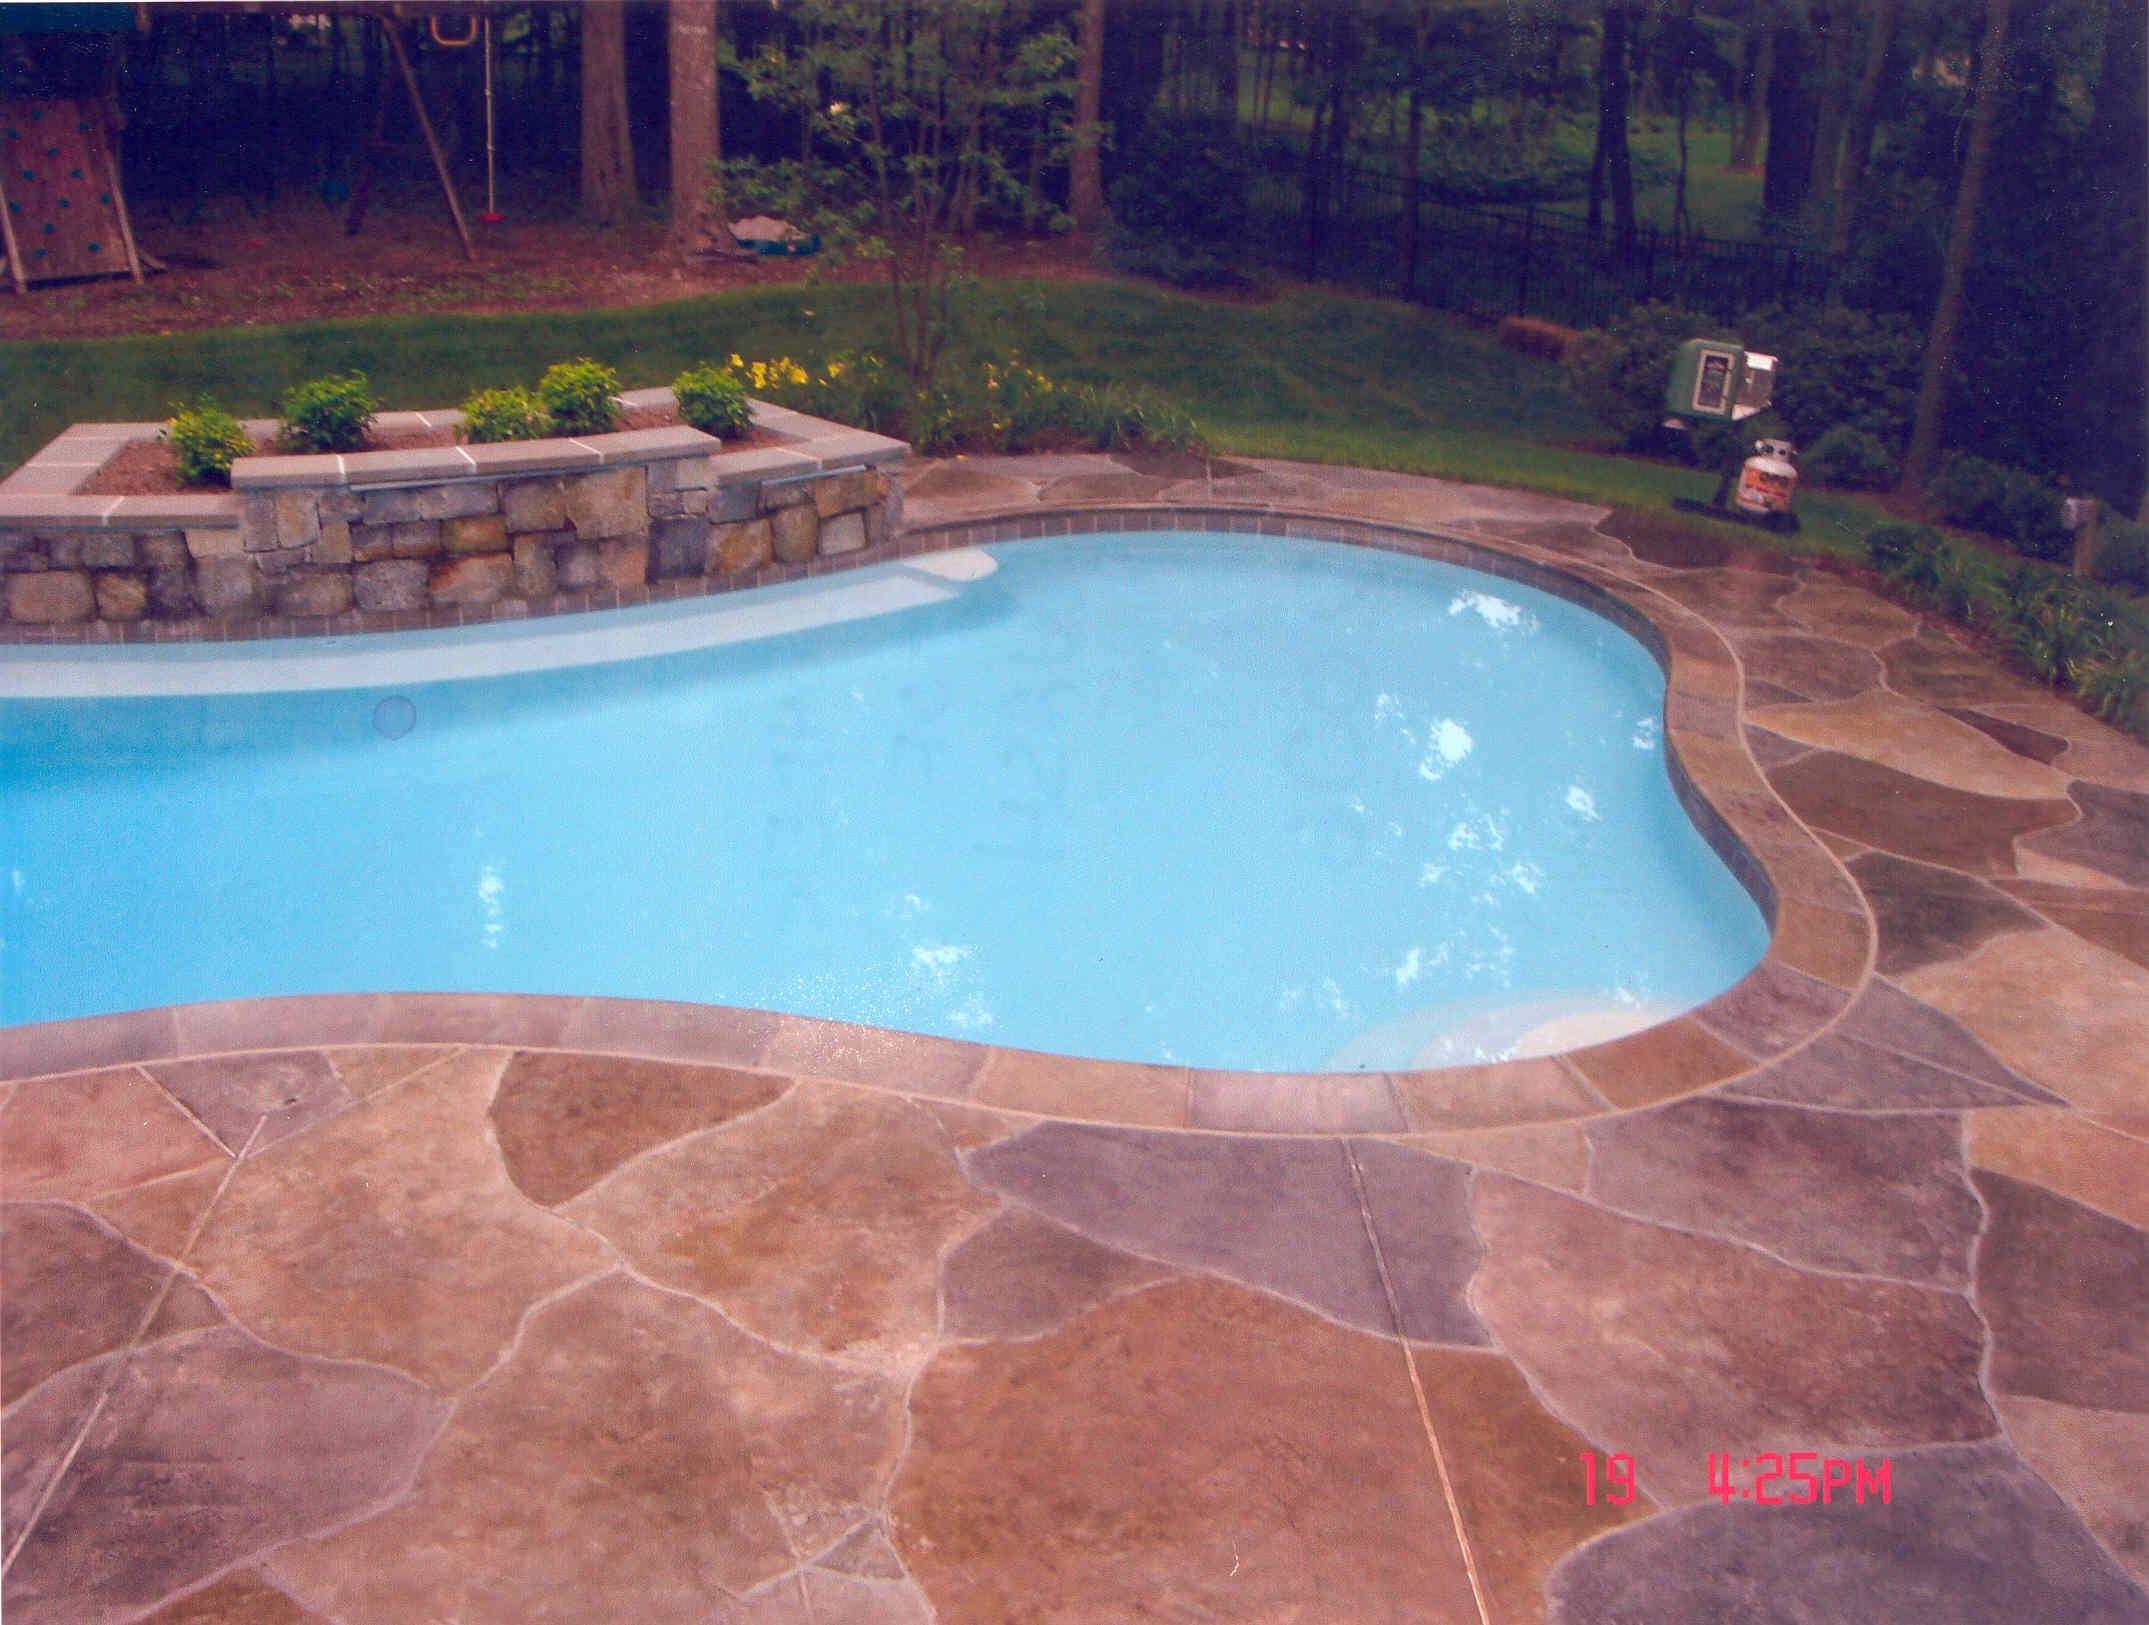 Pools Decorative concrete SunStone installation Sundek of